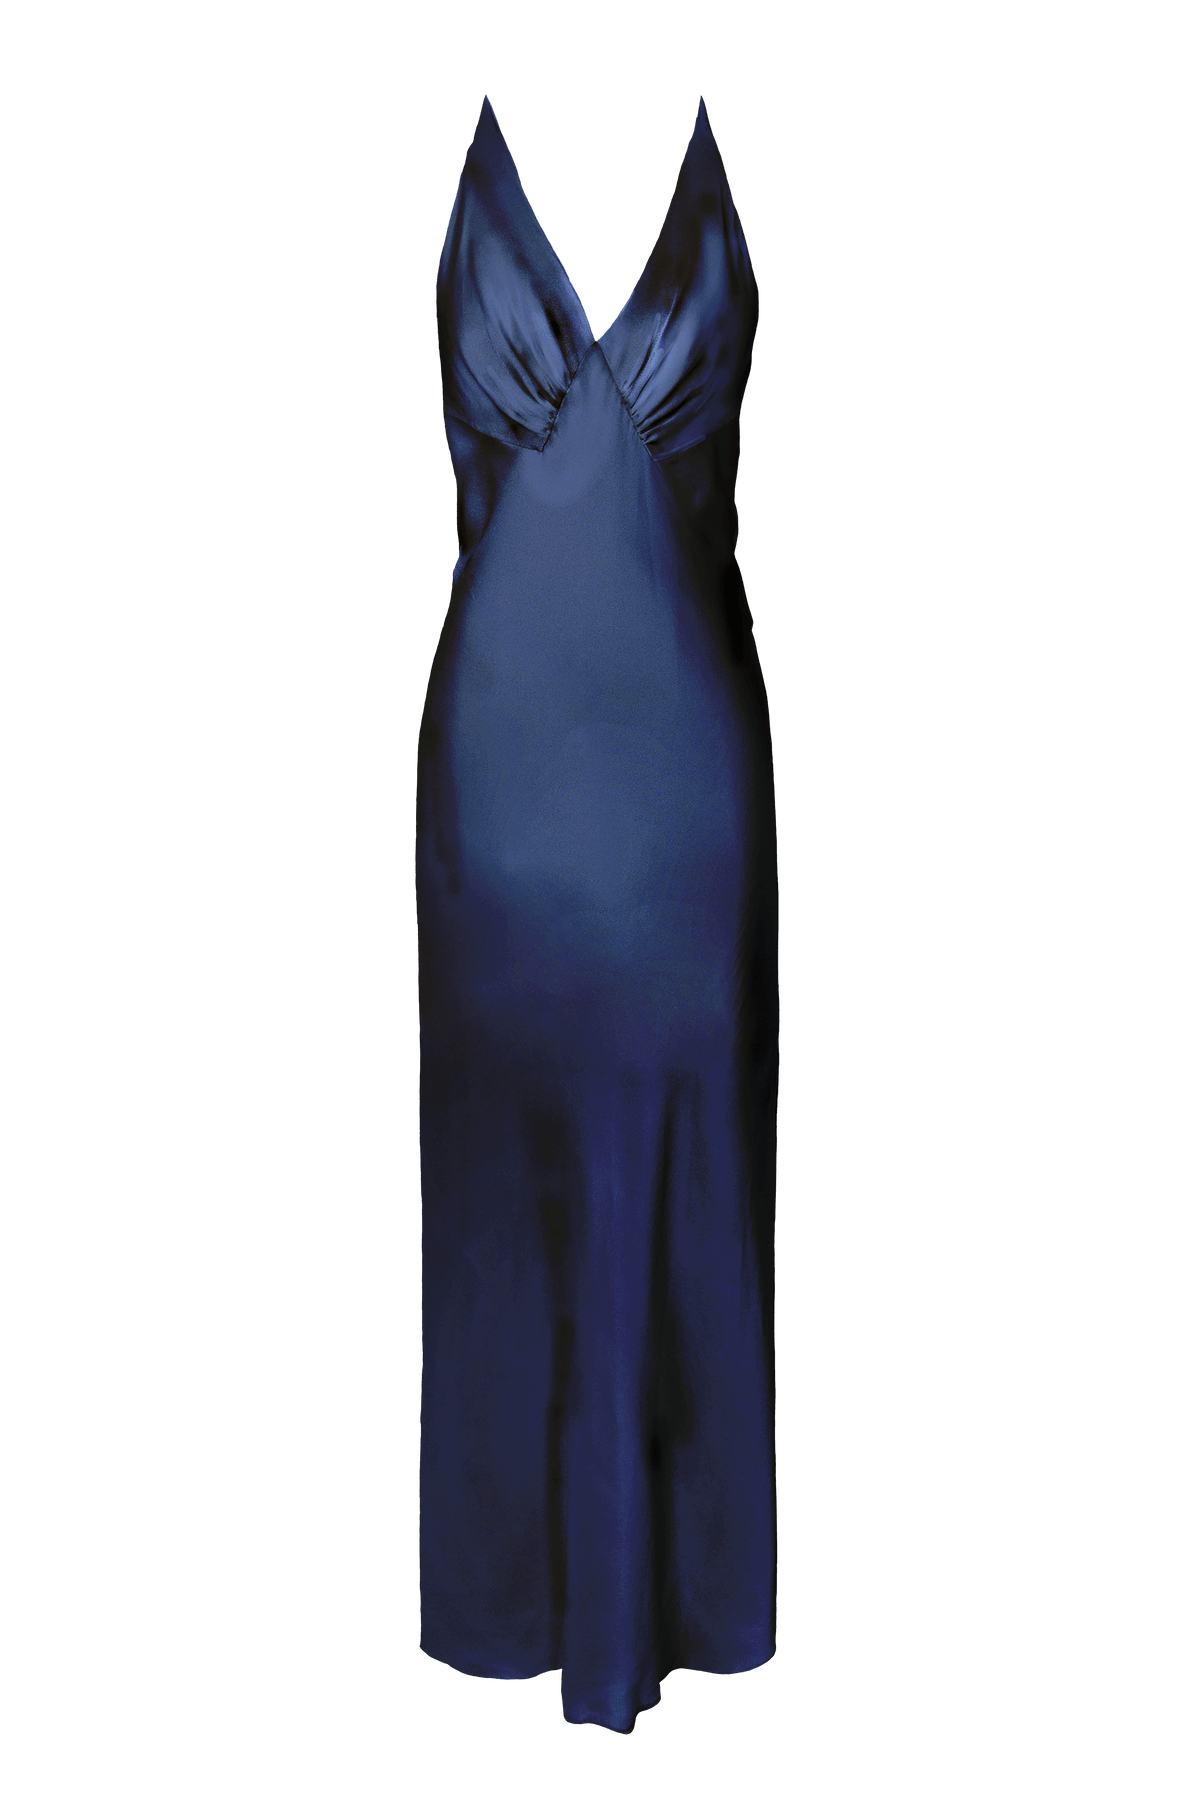 ASHLYN Marlee Silk Dress